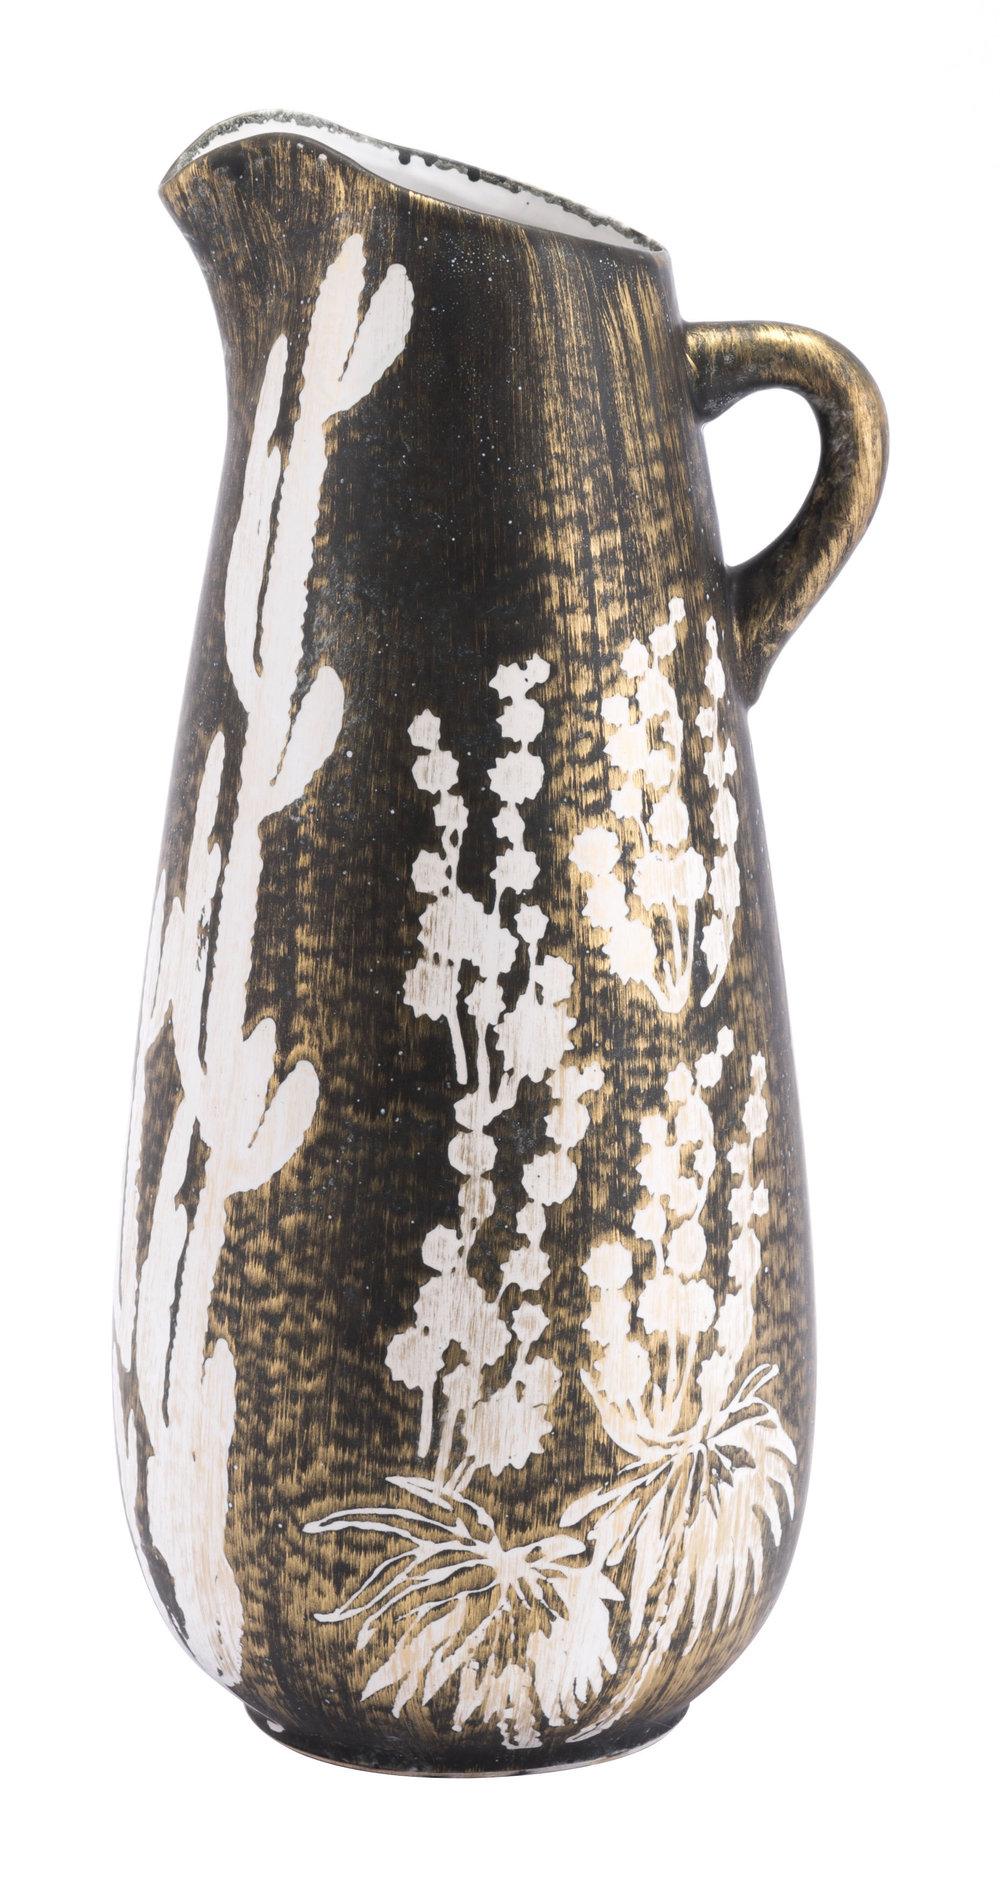 ZUO MODERN CONTEMPORARY, INC - Small Jaci Jar Antique Gold & White